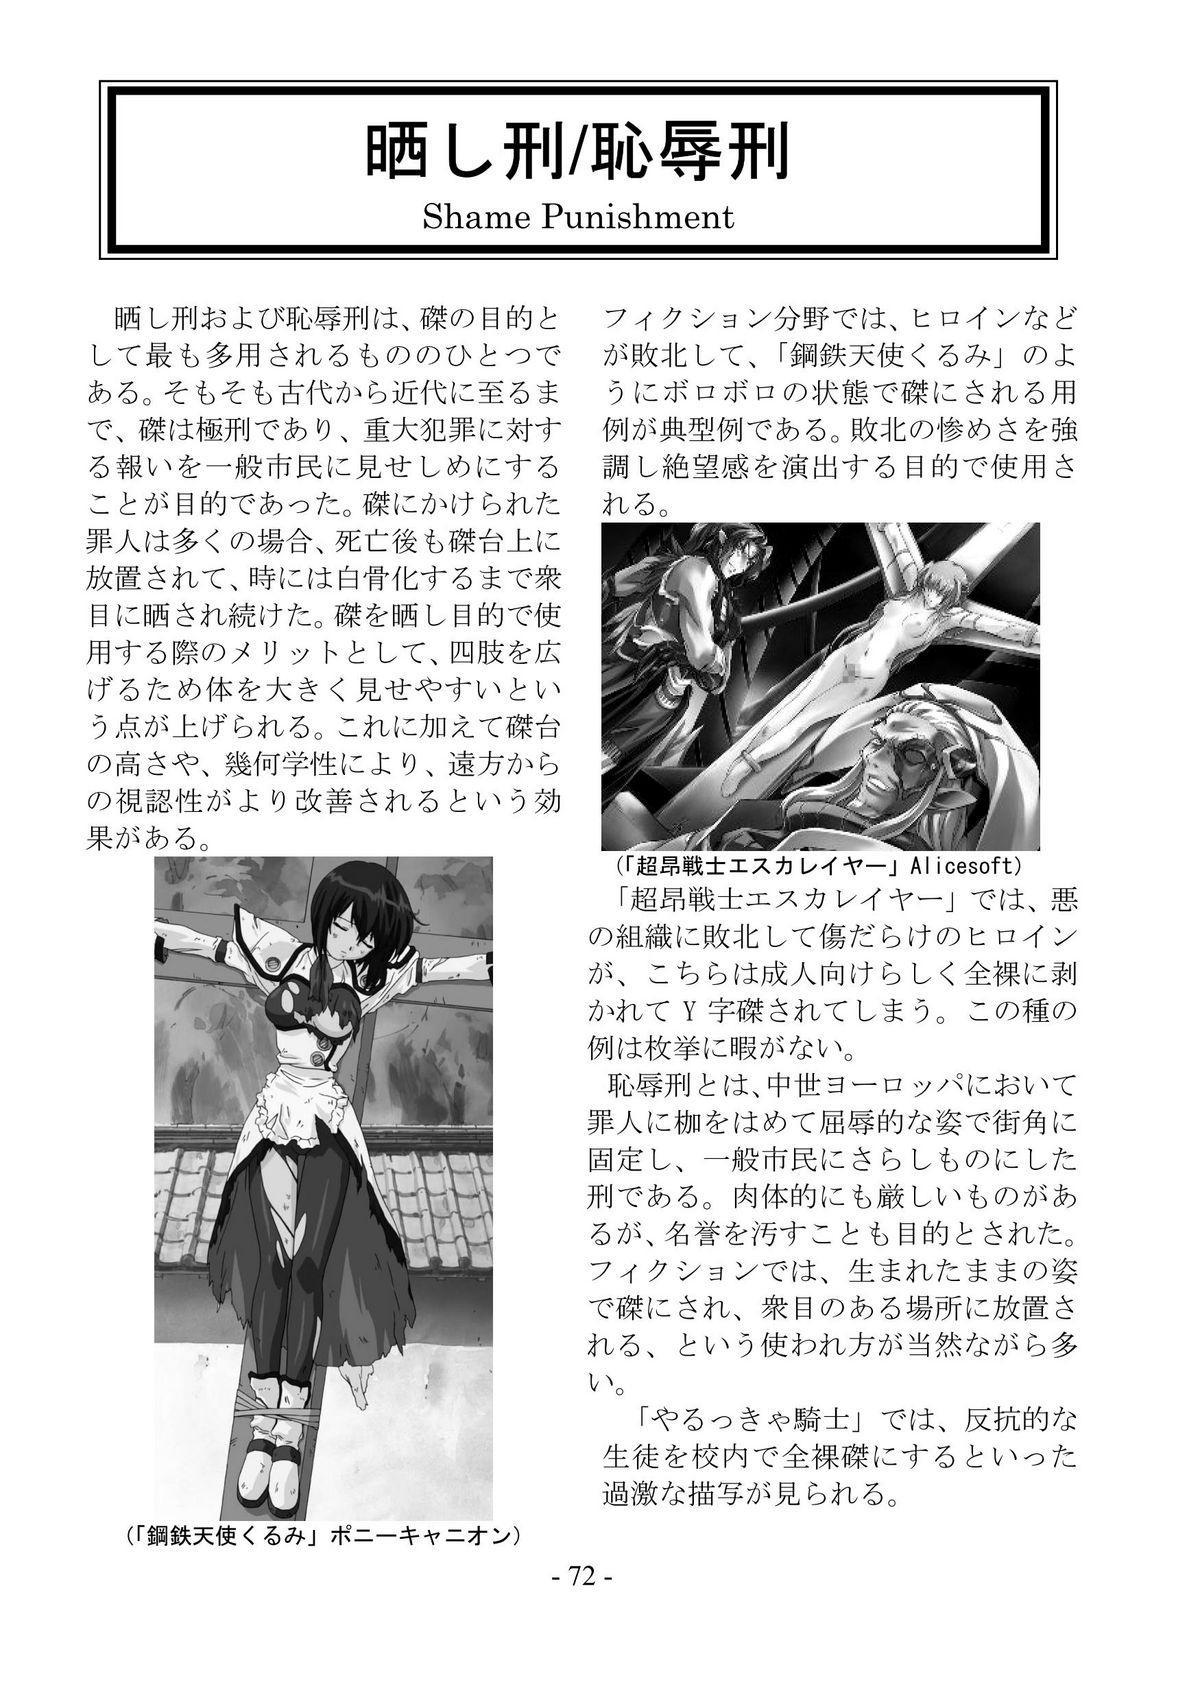 encyclopedia of crucifixion 72